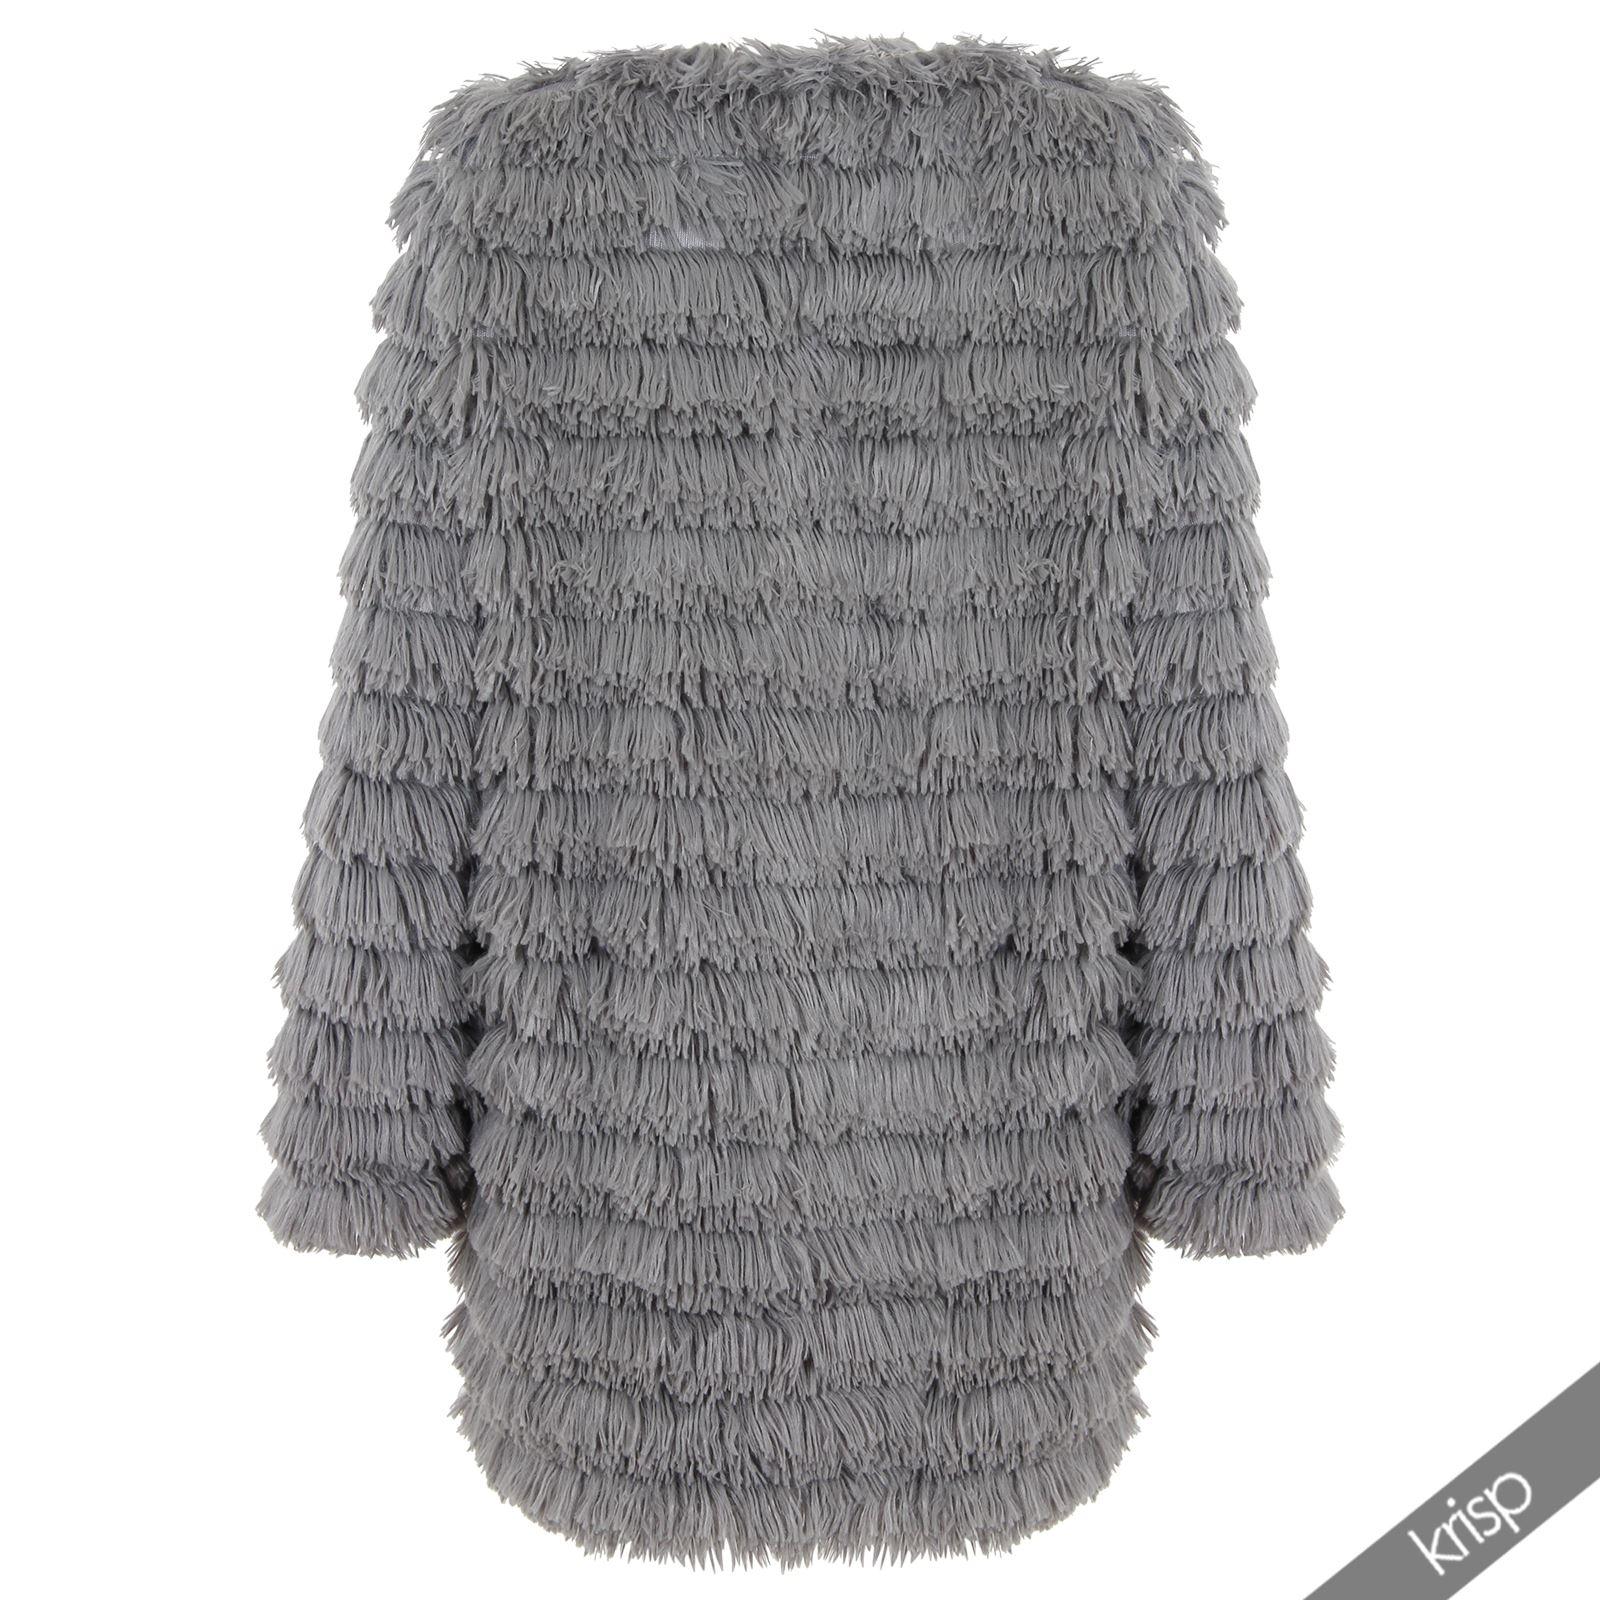 Womens Boho Long Shaggy Soft Faux Fur Knitted Jacket Coat ...